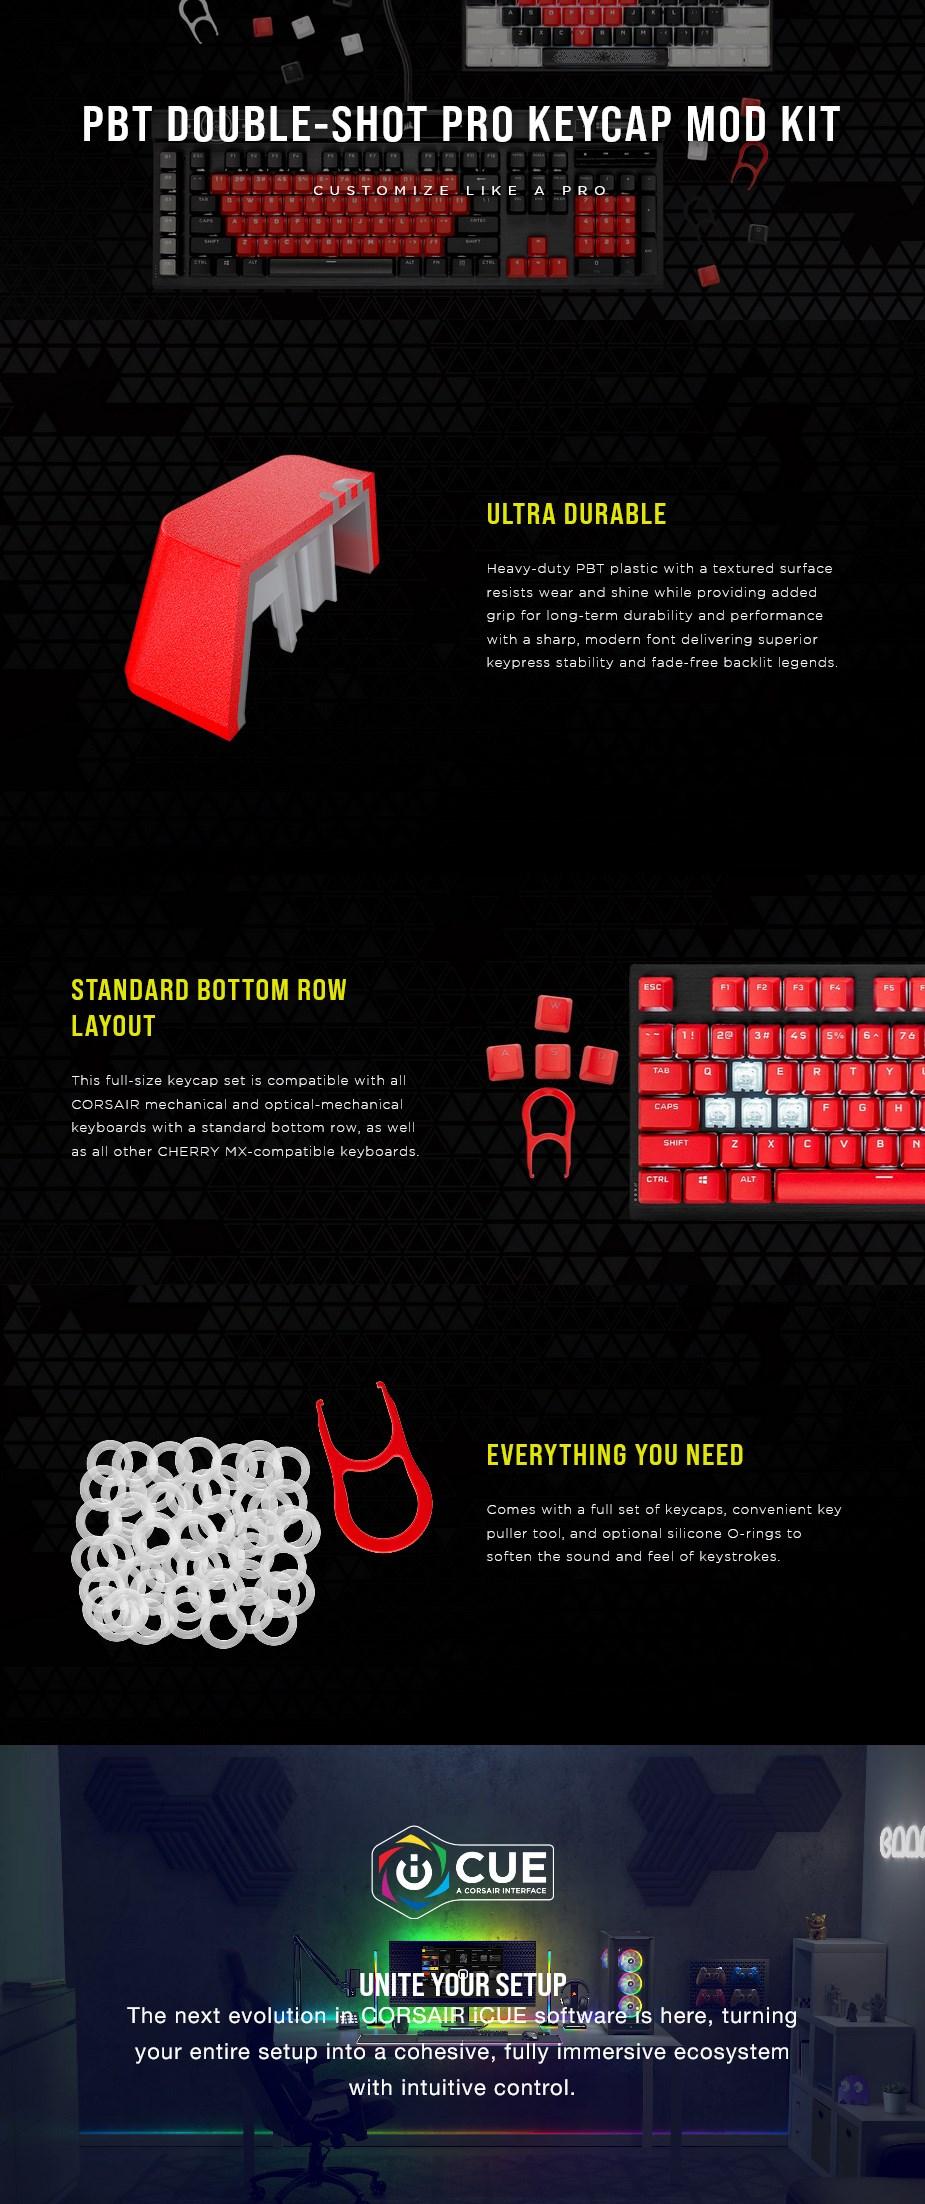 corsair-pbt-doubleshot-pro-keycap-mod-kit-origin-red-ac43251-1.jpg